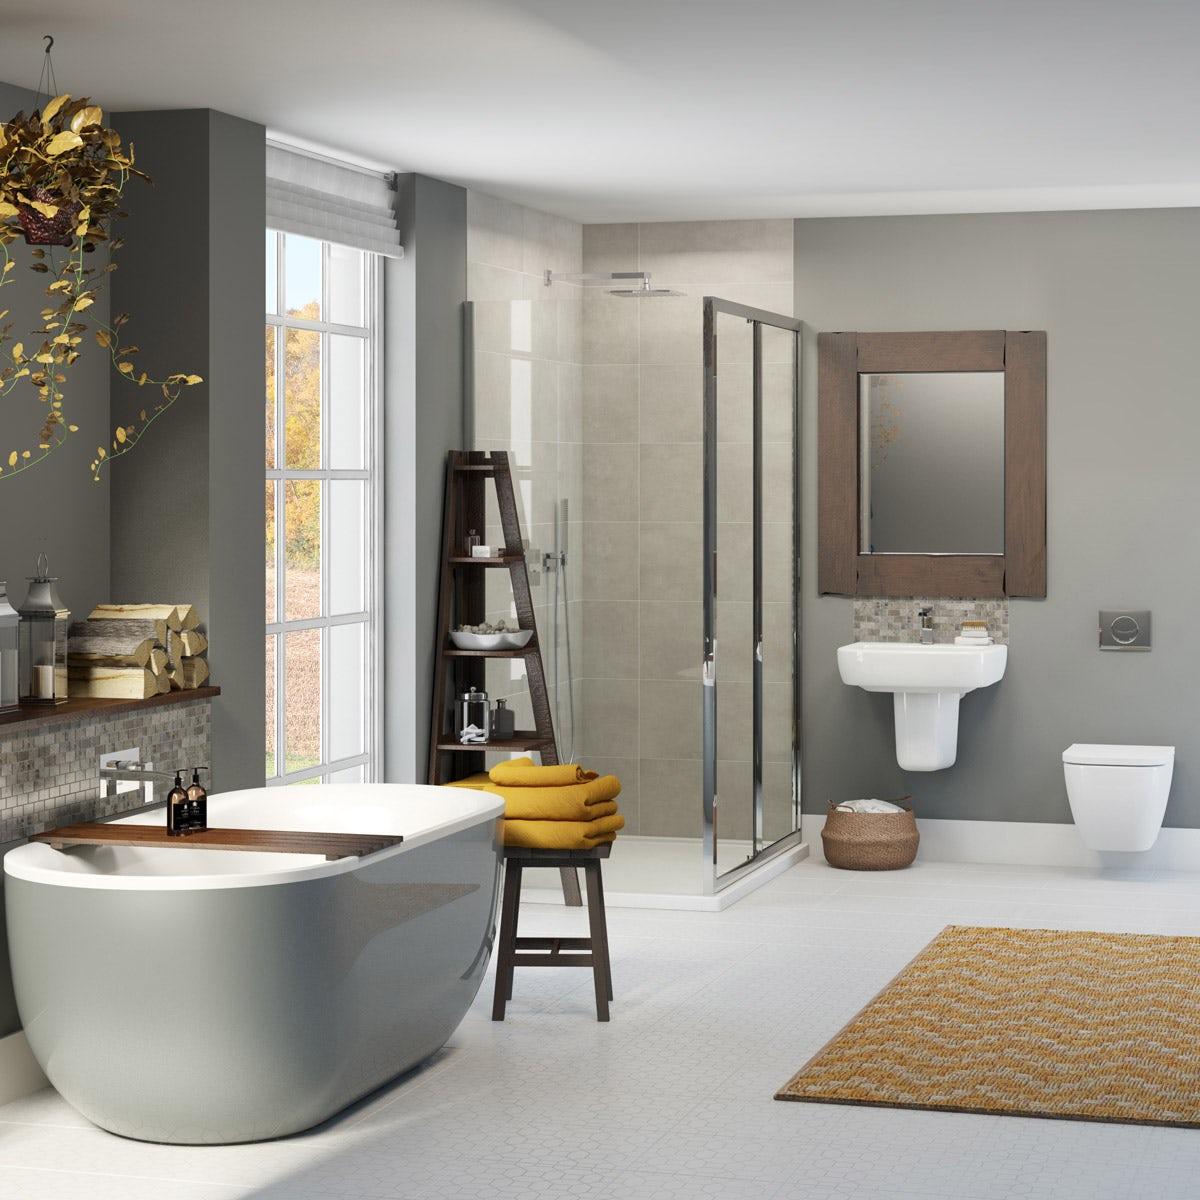 Bathroom suites with shower enclosures - Mode Ellis Storm Bathroom Suite With Shower Enclosure 1200 X 800 Victoriaplum Com